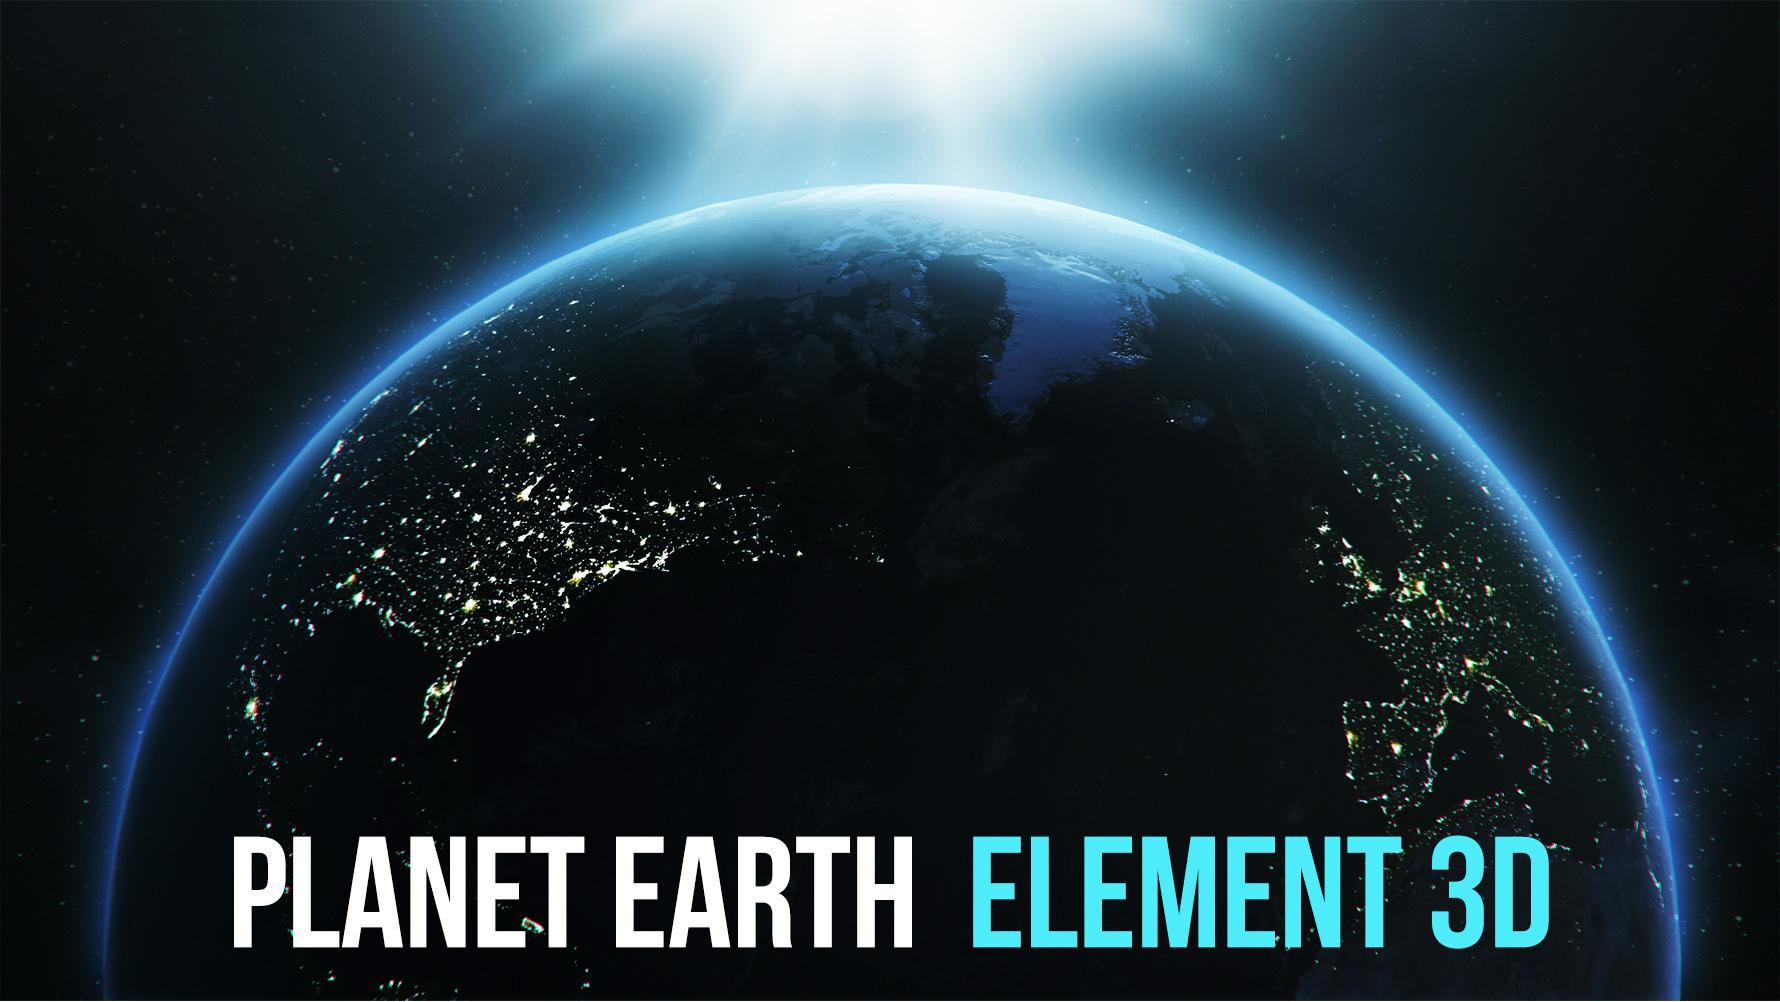 Realistic Earth Element 3d By Pixelgem 3docean